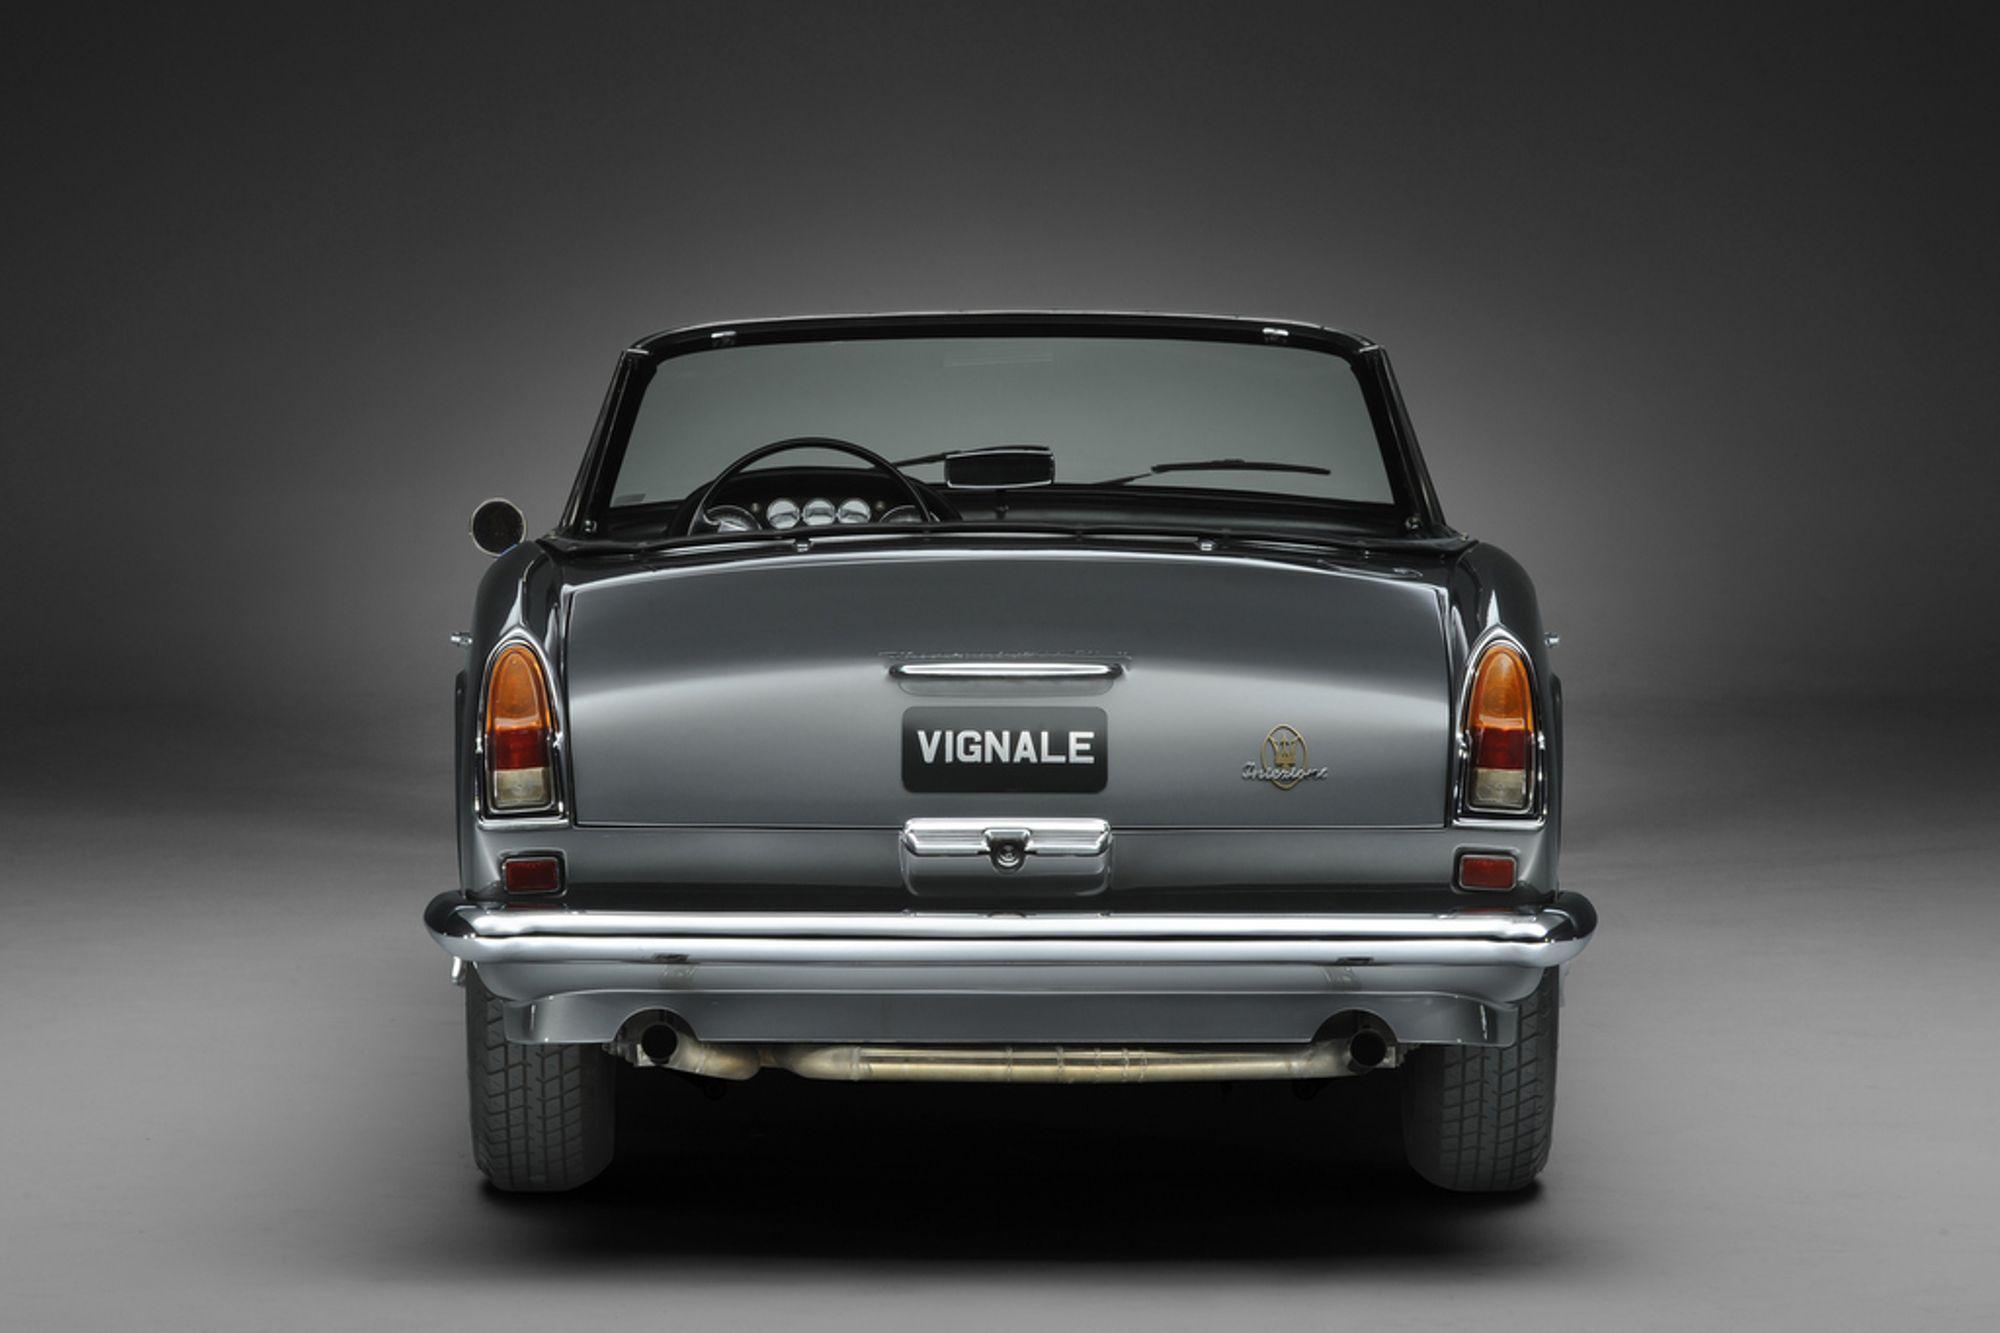 1963 Maserati 3500 GTI Vignale Spyder | Sold | Woodham ...